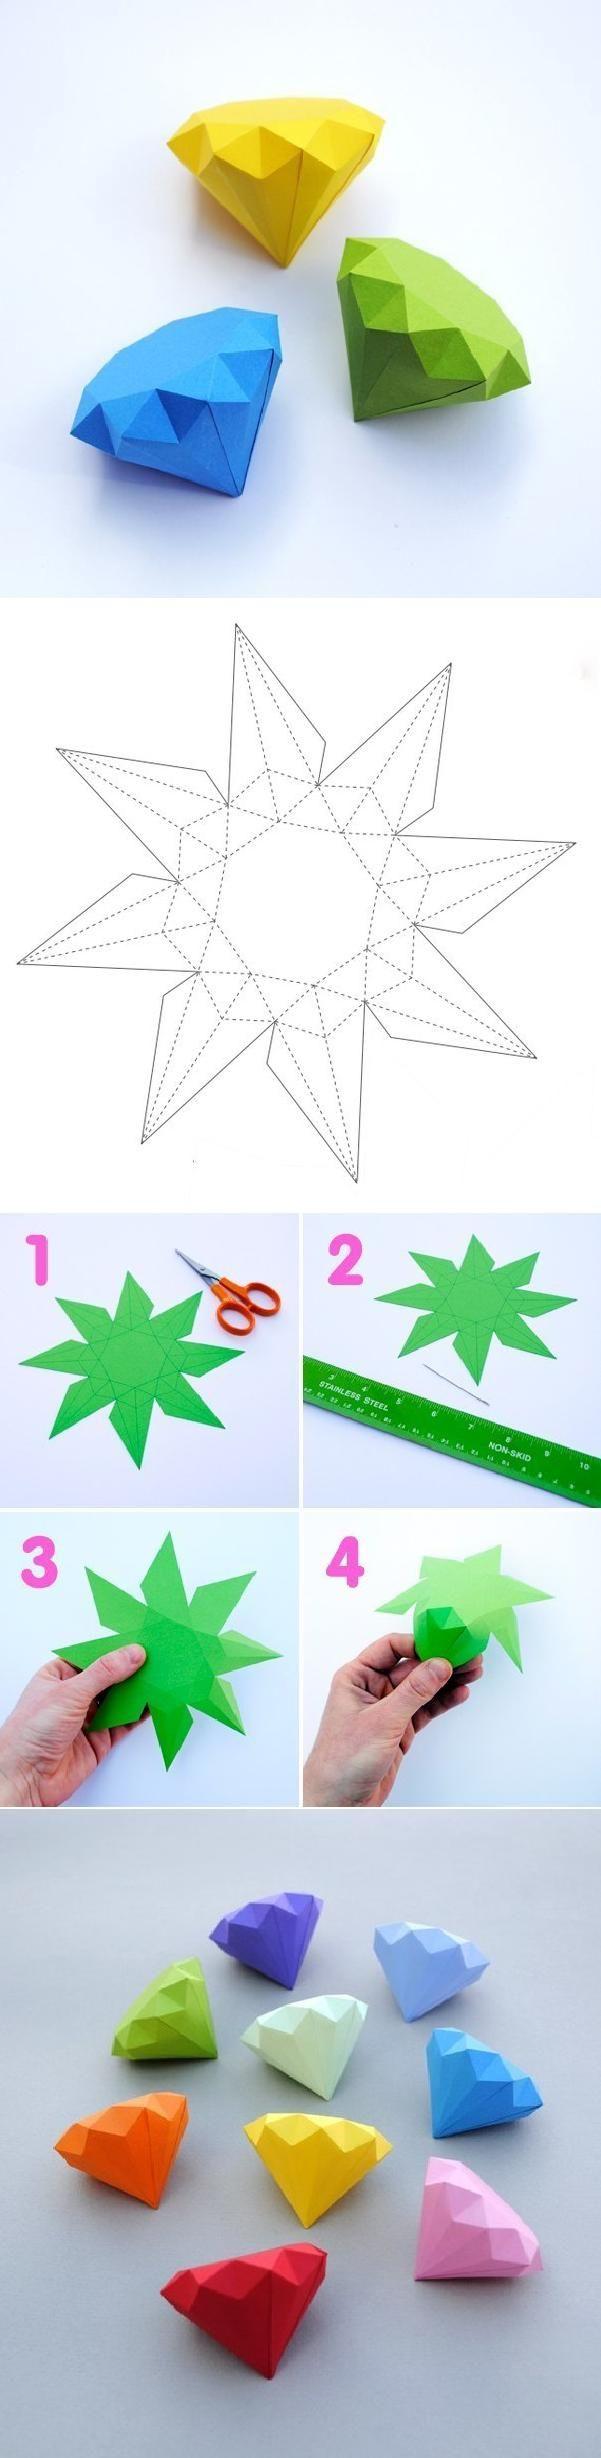 "<input+type=""hidden""+value=""""+data-frizzlyPostContainer=""""+data-frizzlyPostUrl=""http://www.usefuldiy.com/diy-paper-diamonds/""+data-frizzlyPostTitle=""DIY+Paper+Diamonds""+data-frizzlyHoverContainer=""""><p>>>>+Craft+Tutorials+More+Free+Instructions+Free+Tutorials+More+Craft+Tutorials</p>"